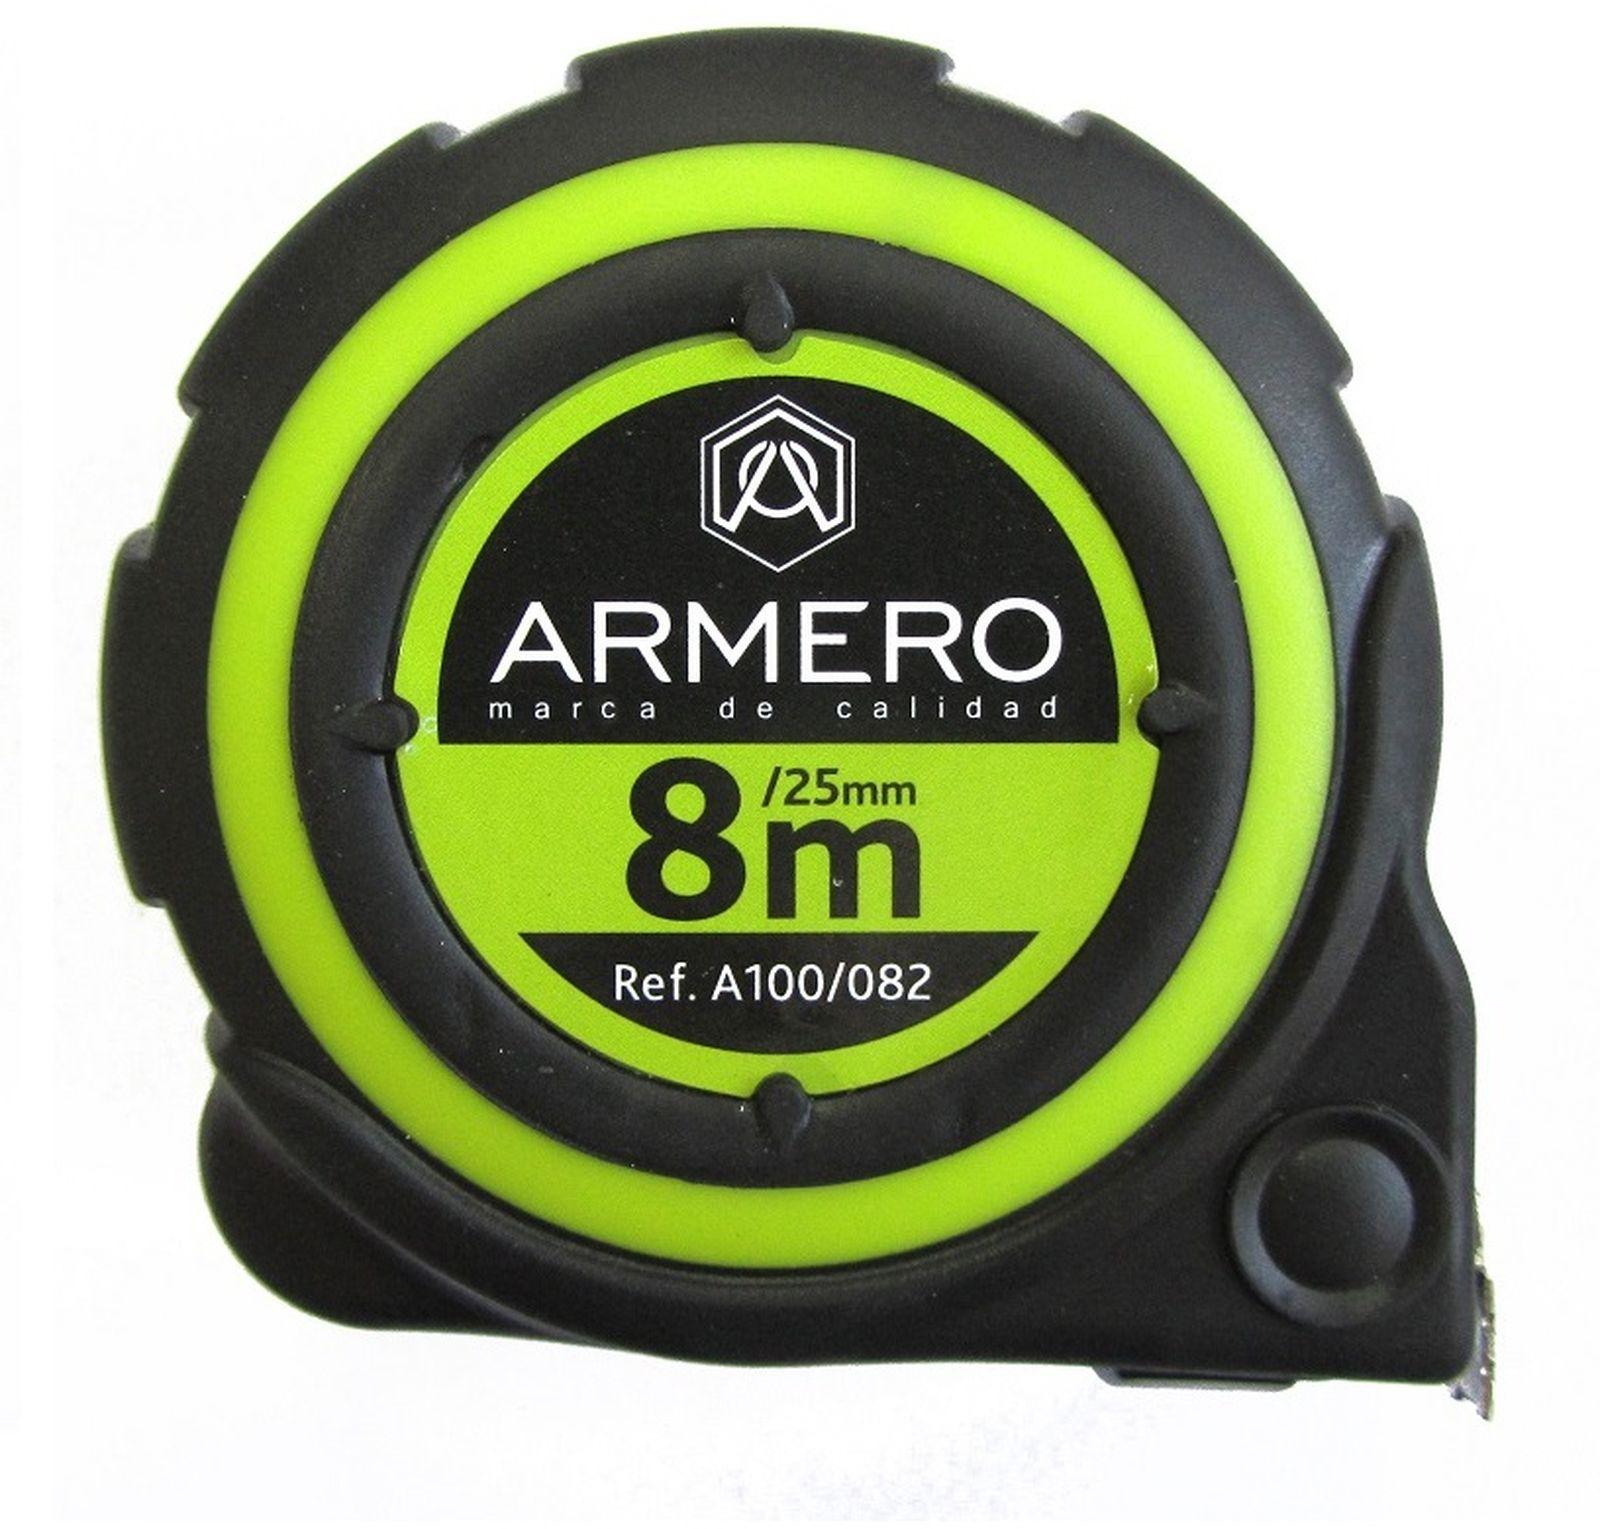 Рулетка с автоблокировкой Armero, магнит, нейлон, 25 мм х 8 м